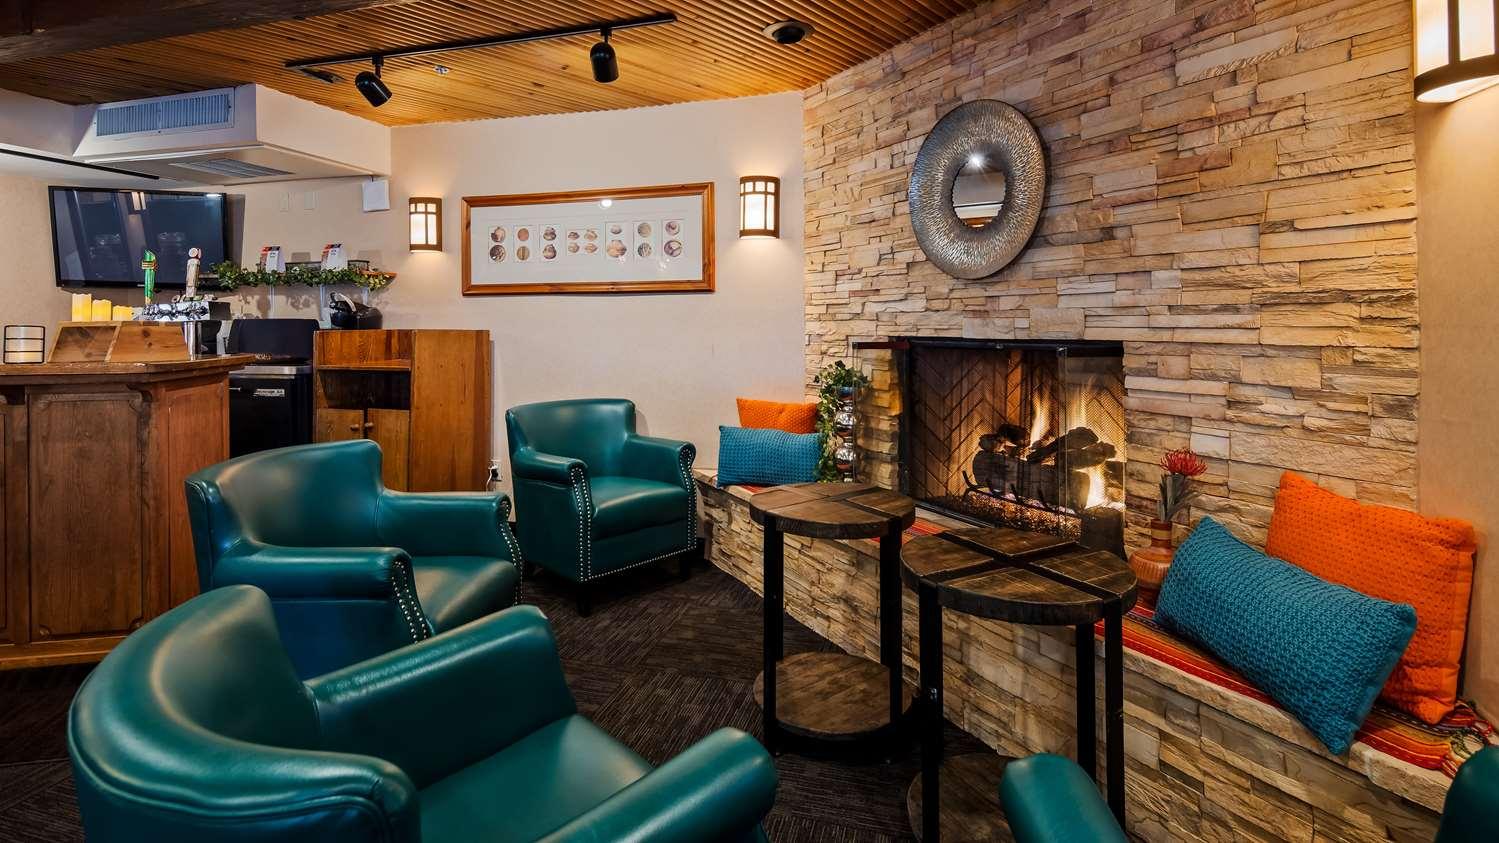 Restaurant - SureStay Collection by Best Western Inn at Santa Fe